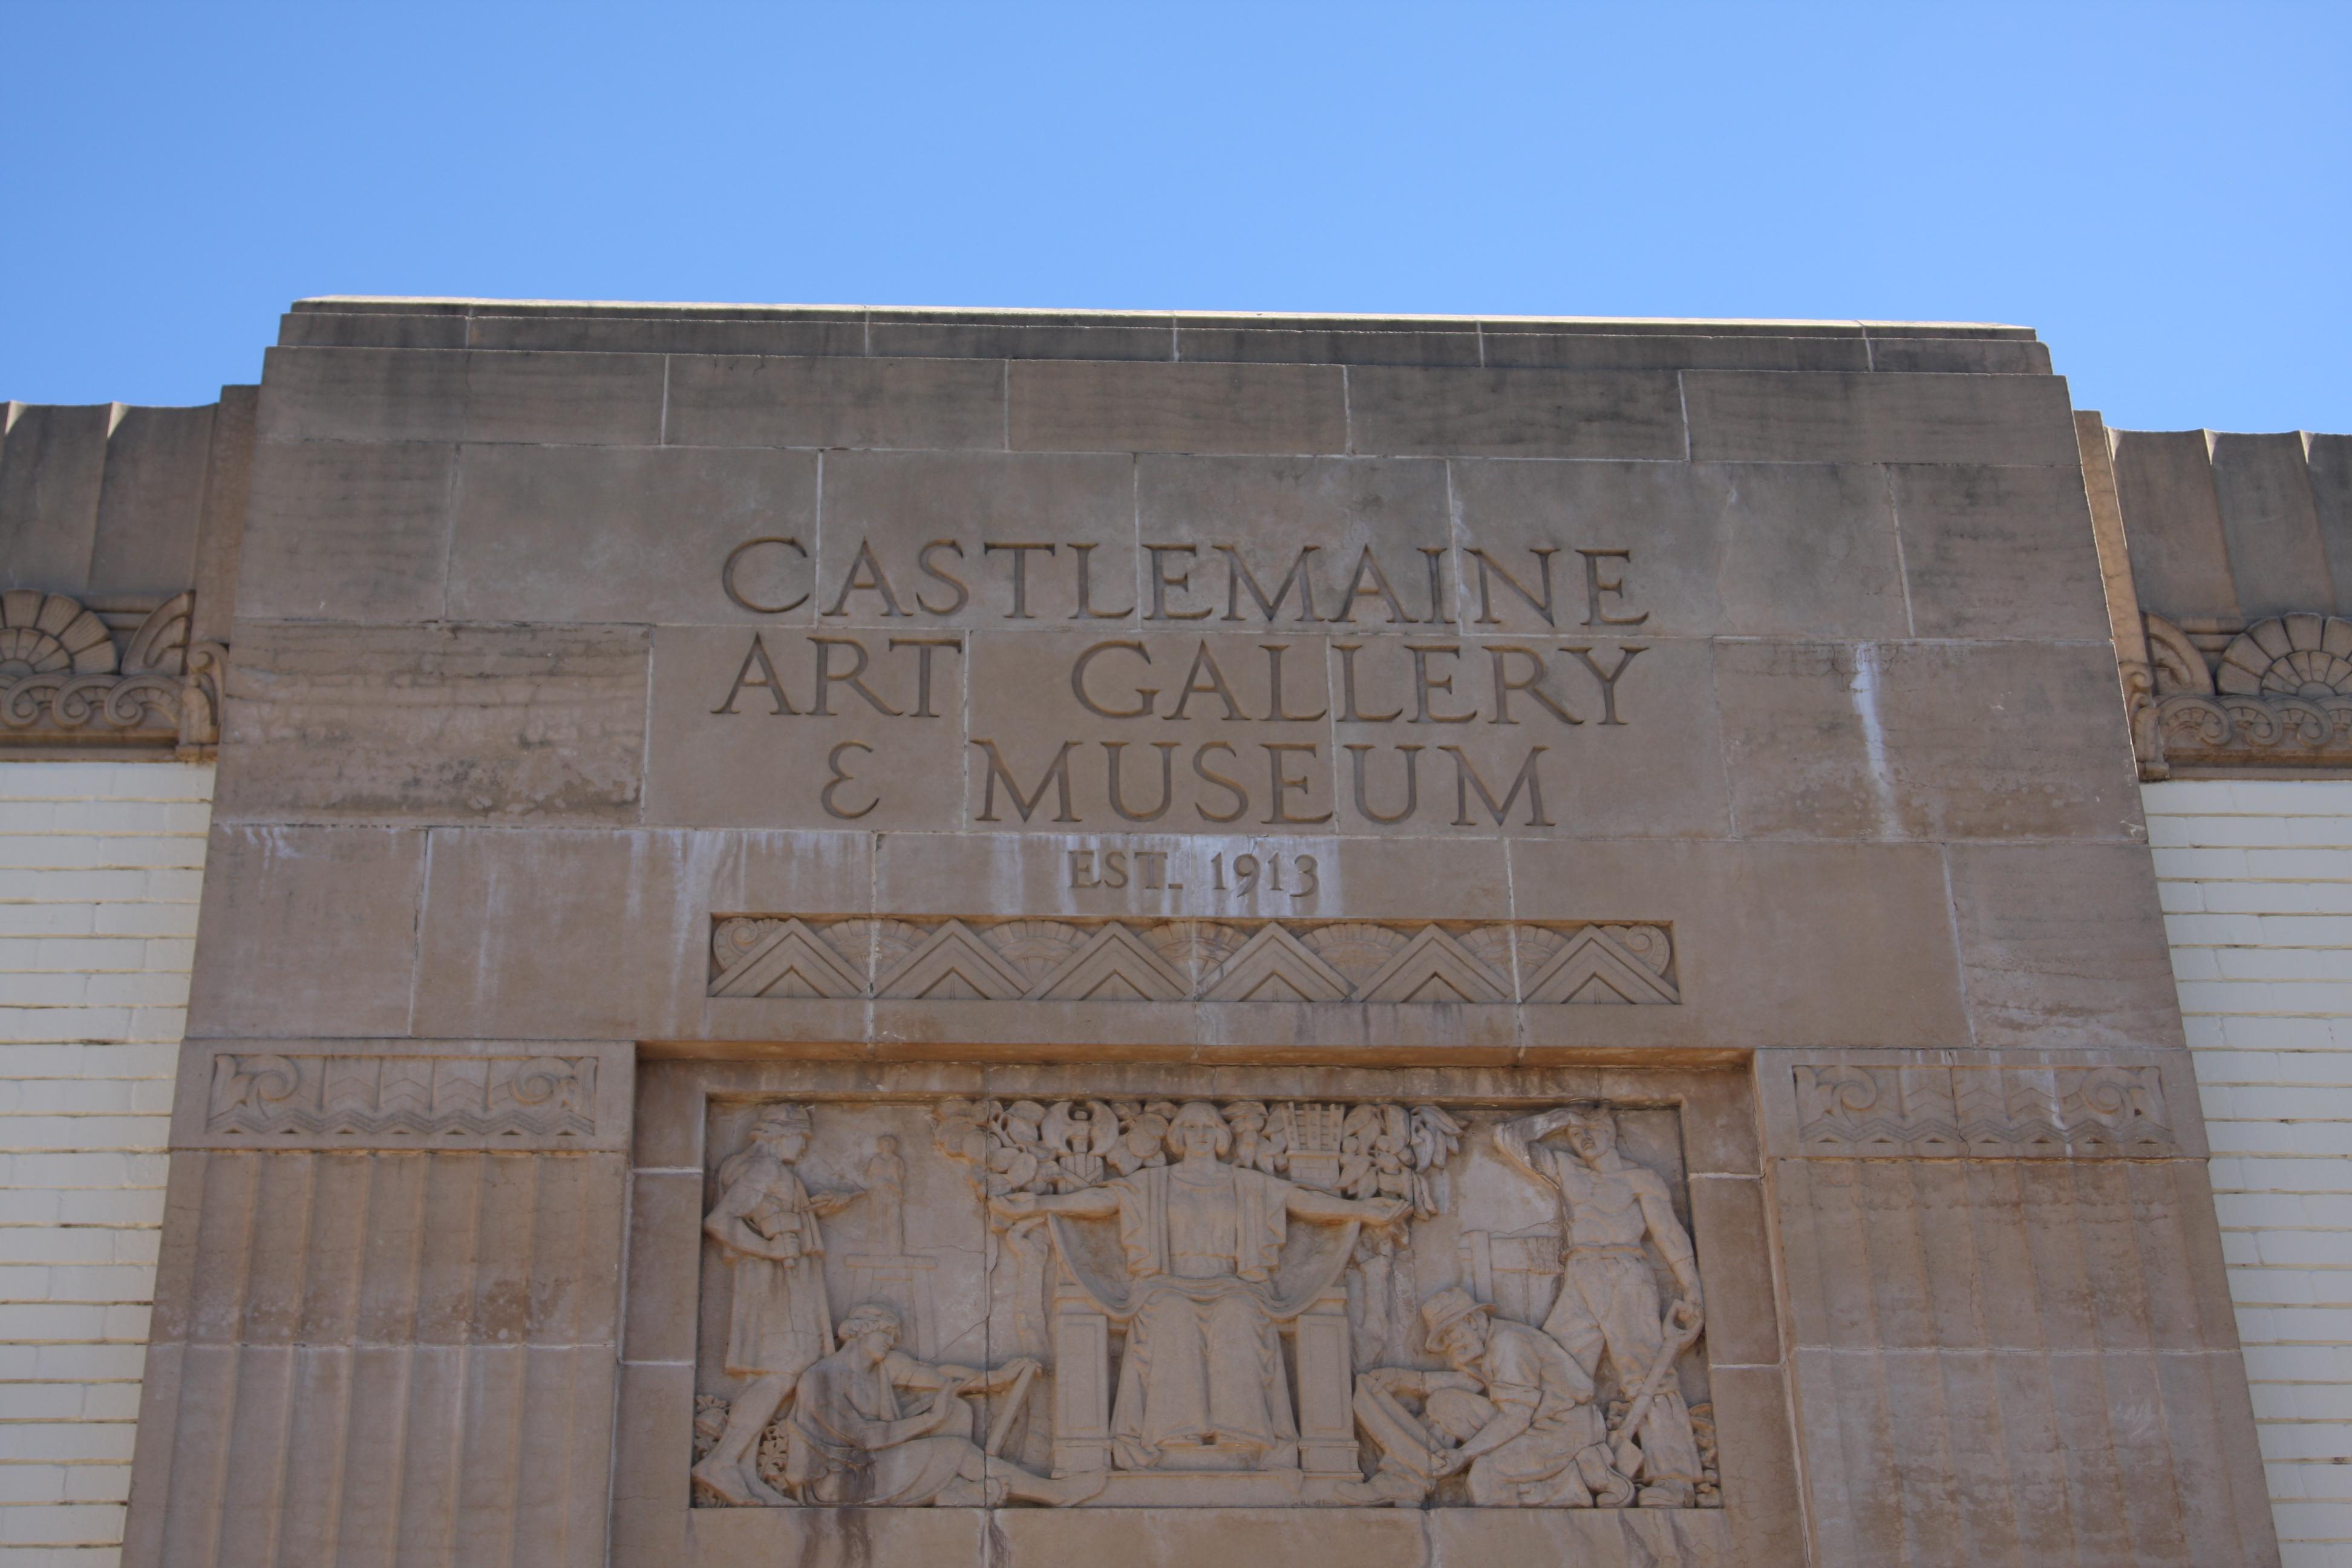 Castlemaine Art Gallery & Museum building decorative sign